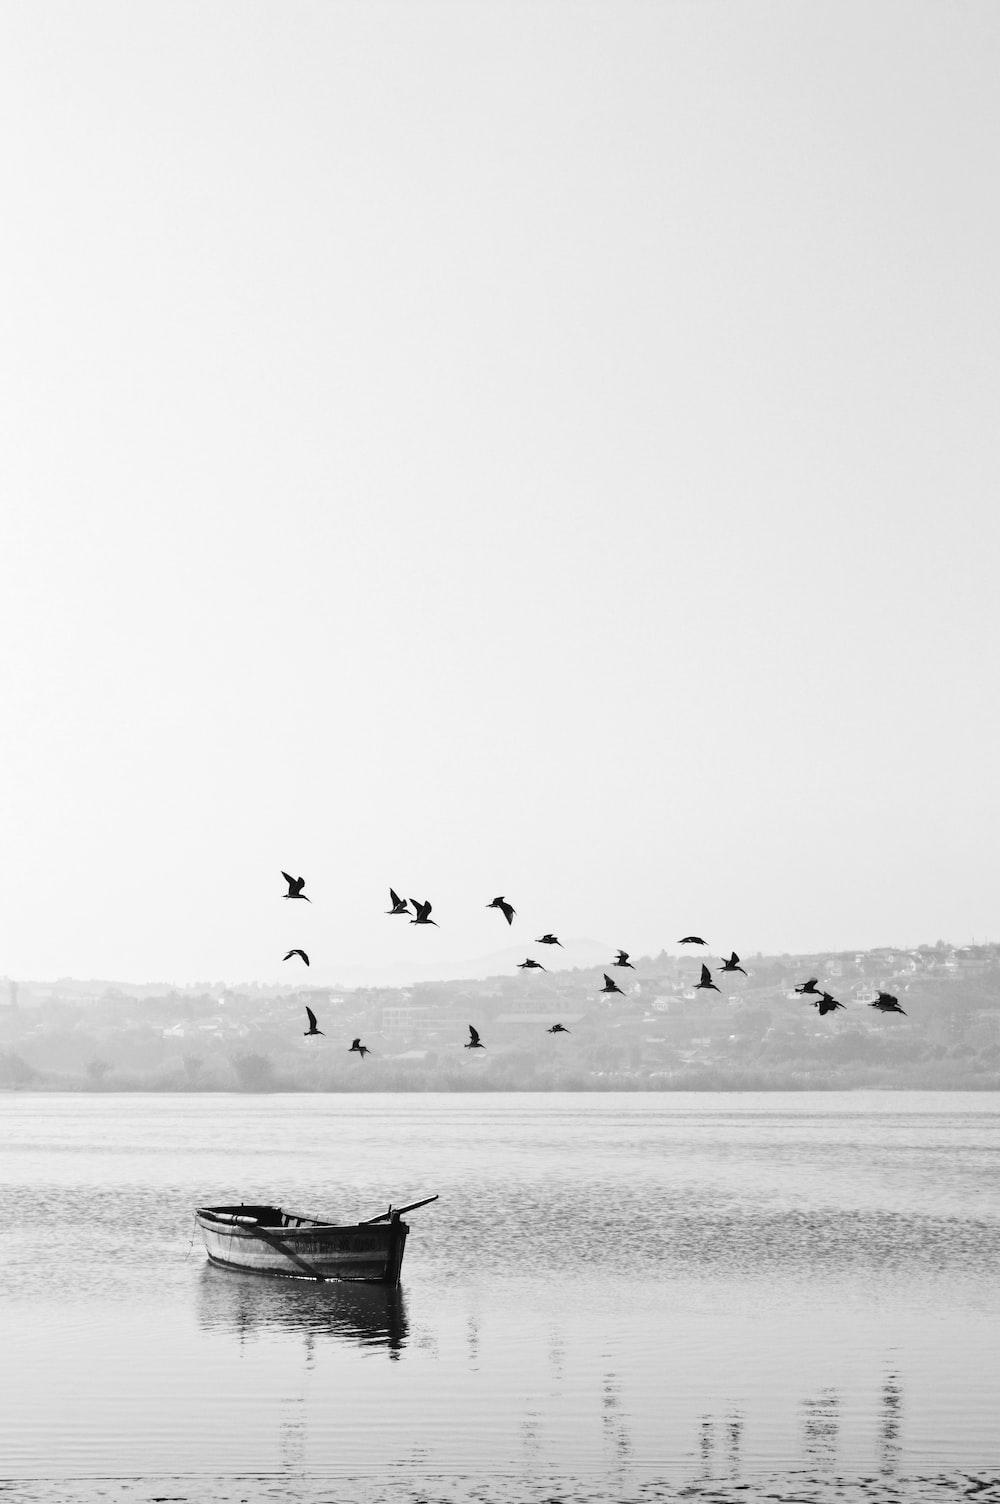 birds flying over boat